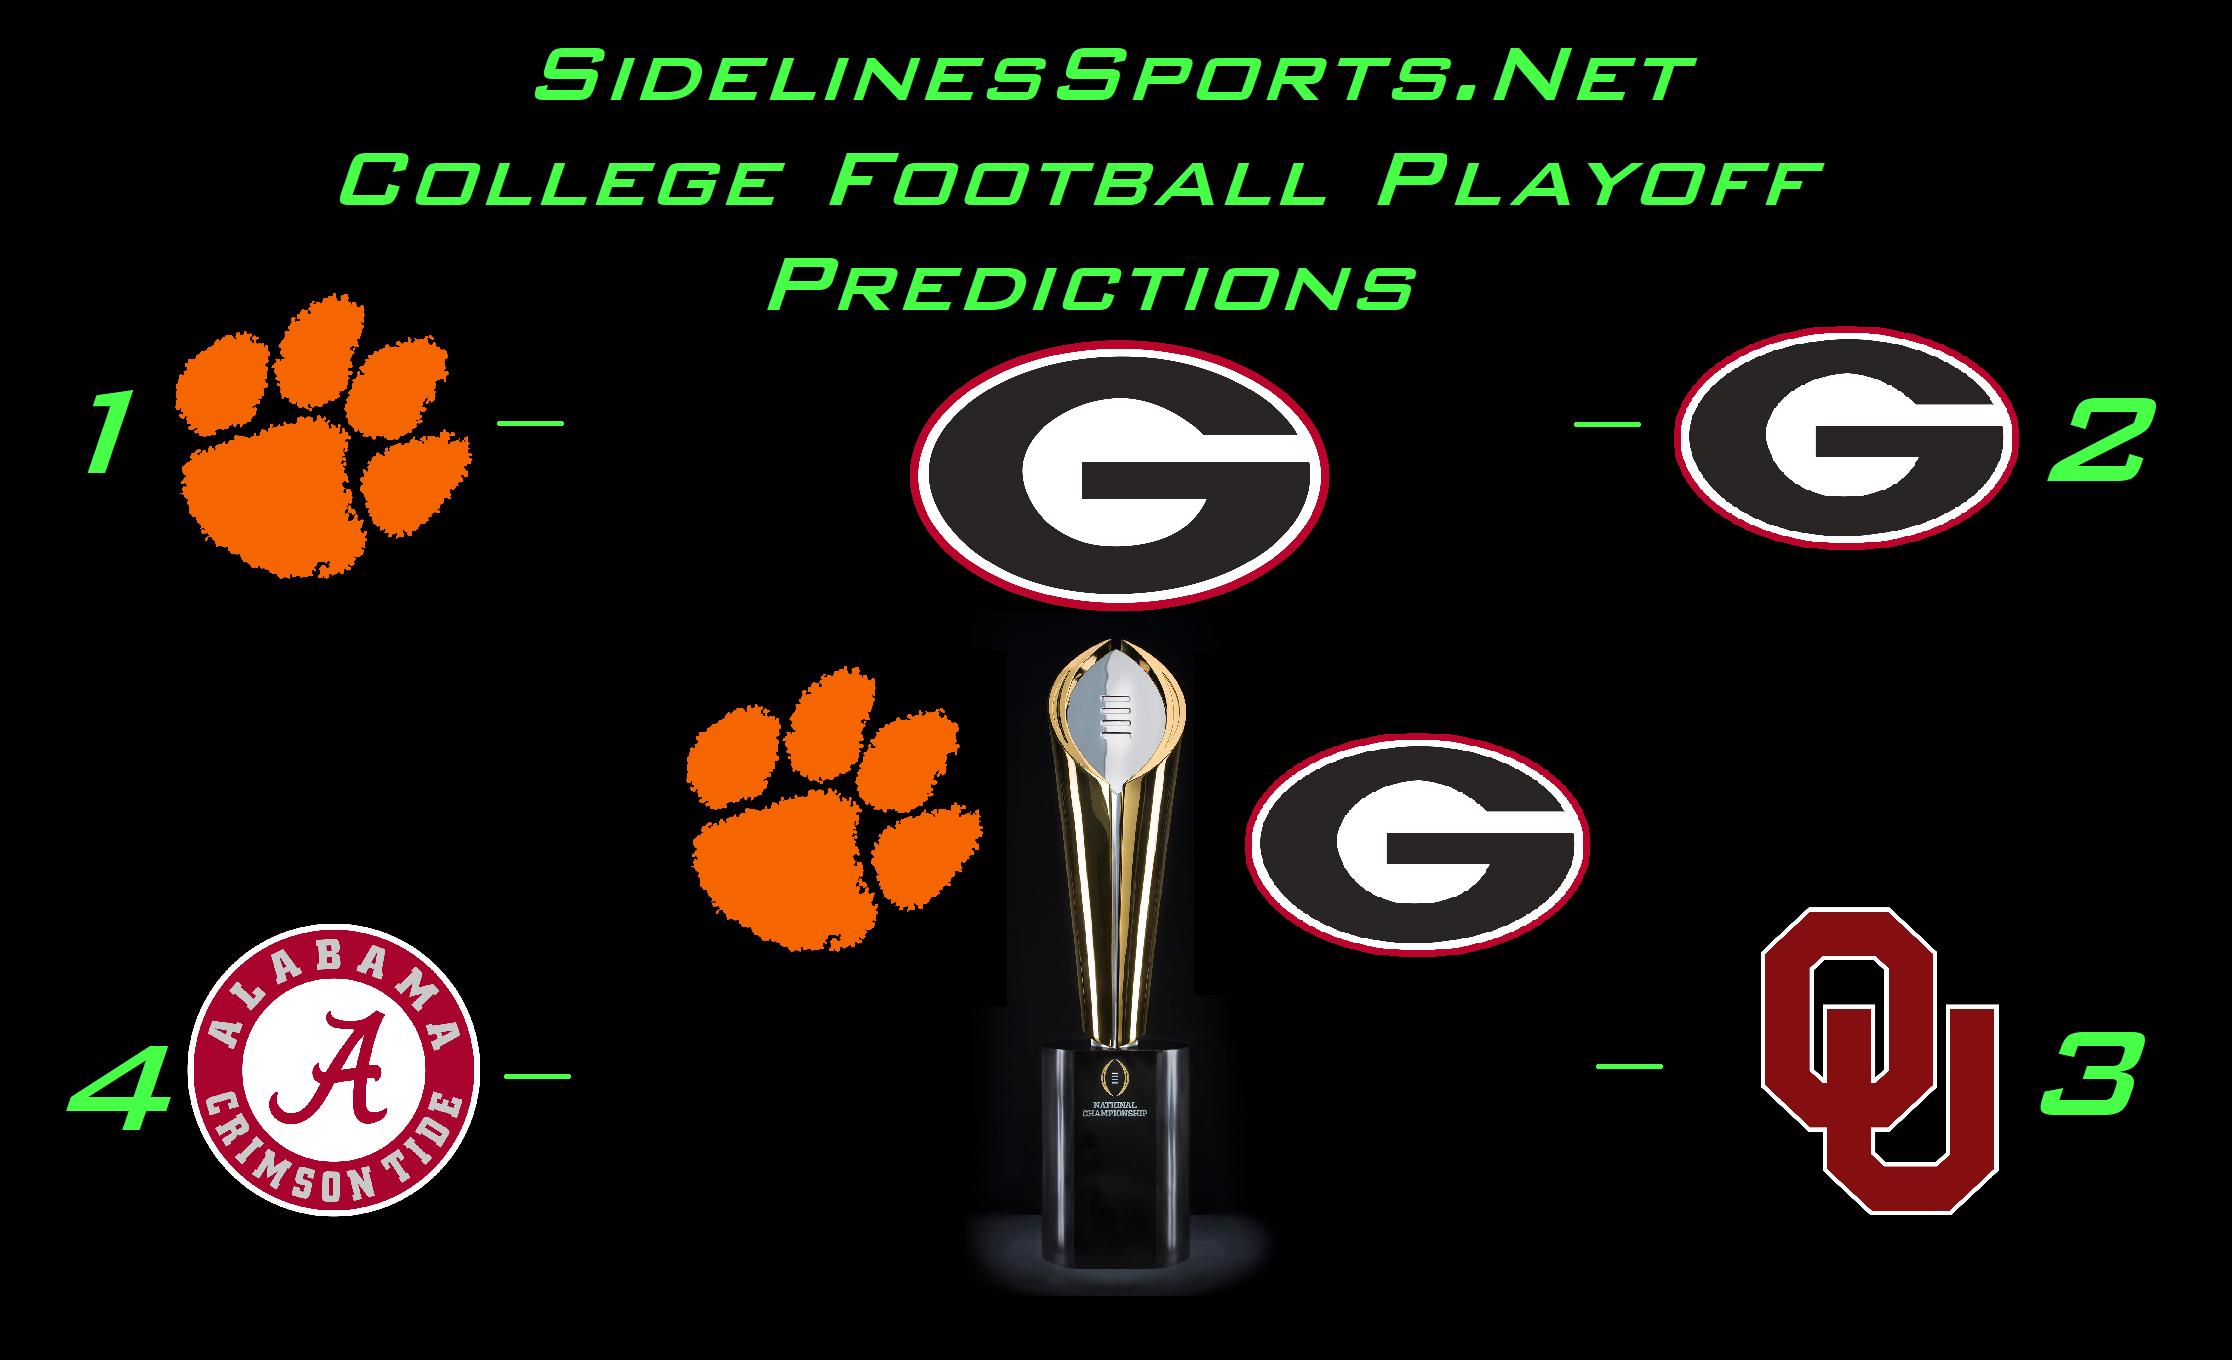 CFP prediction 1